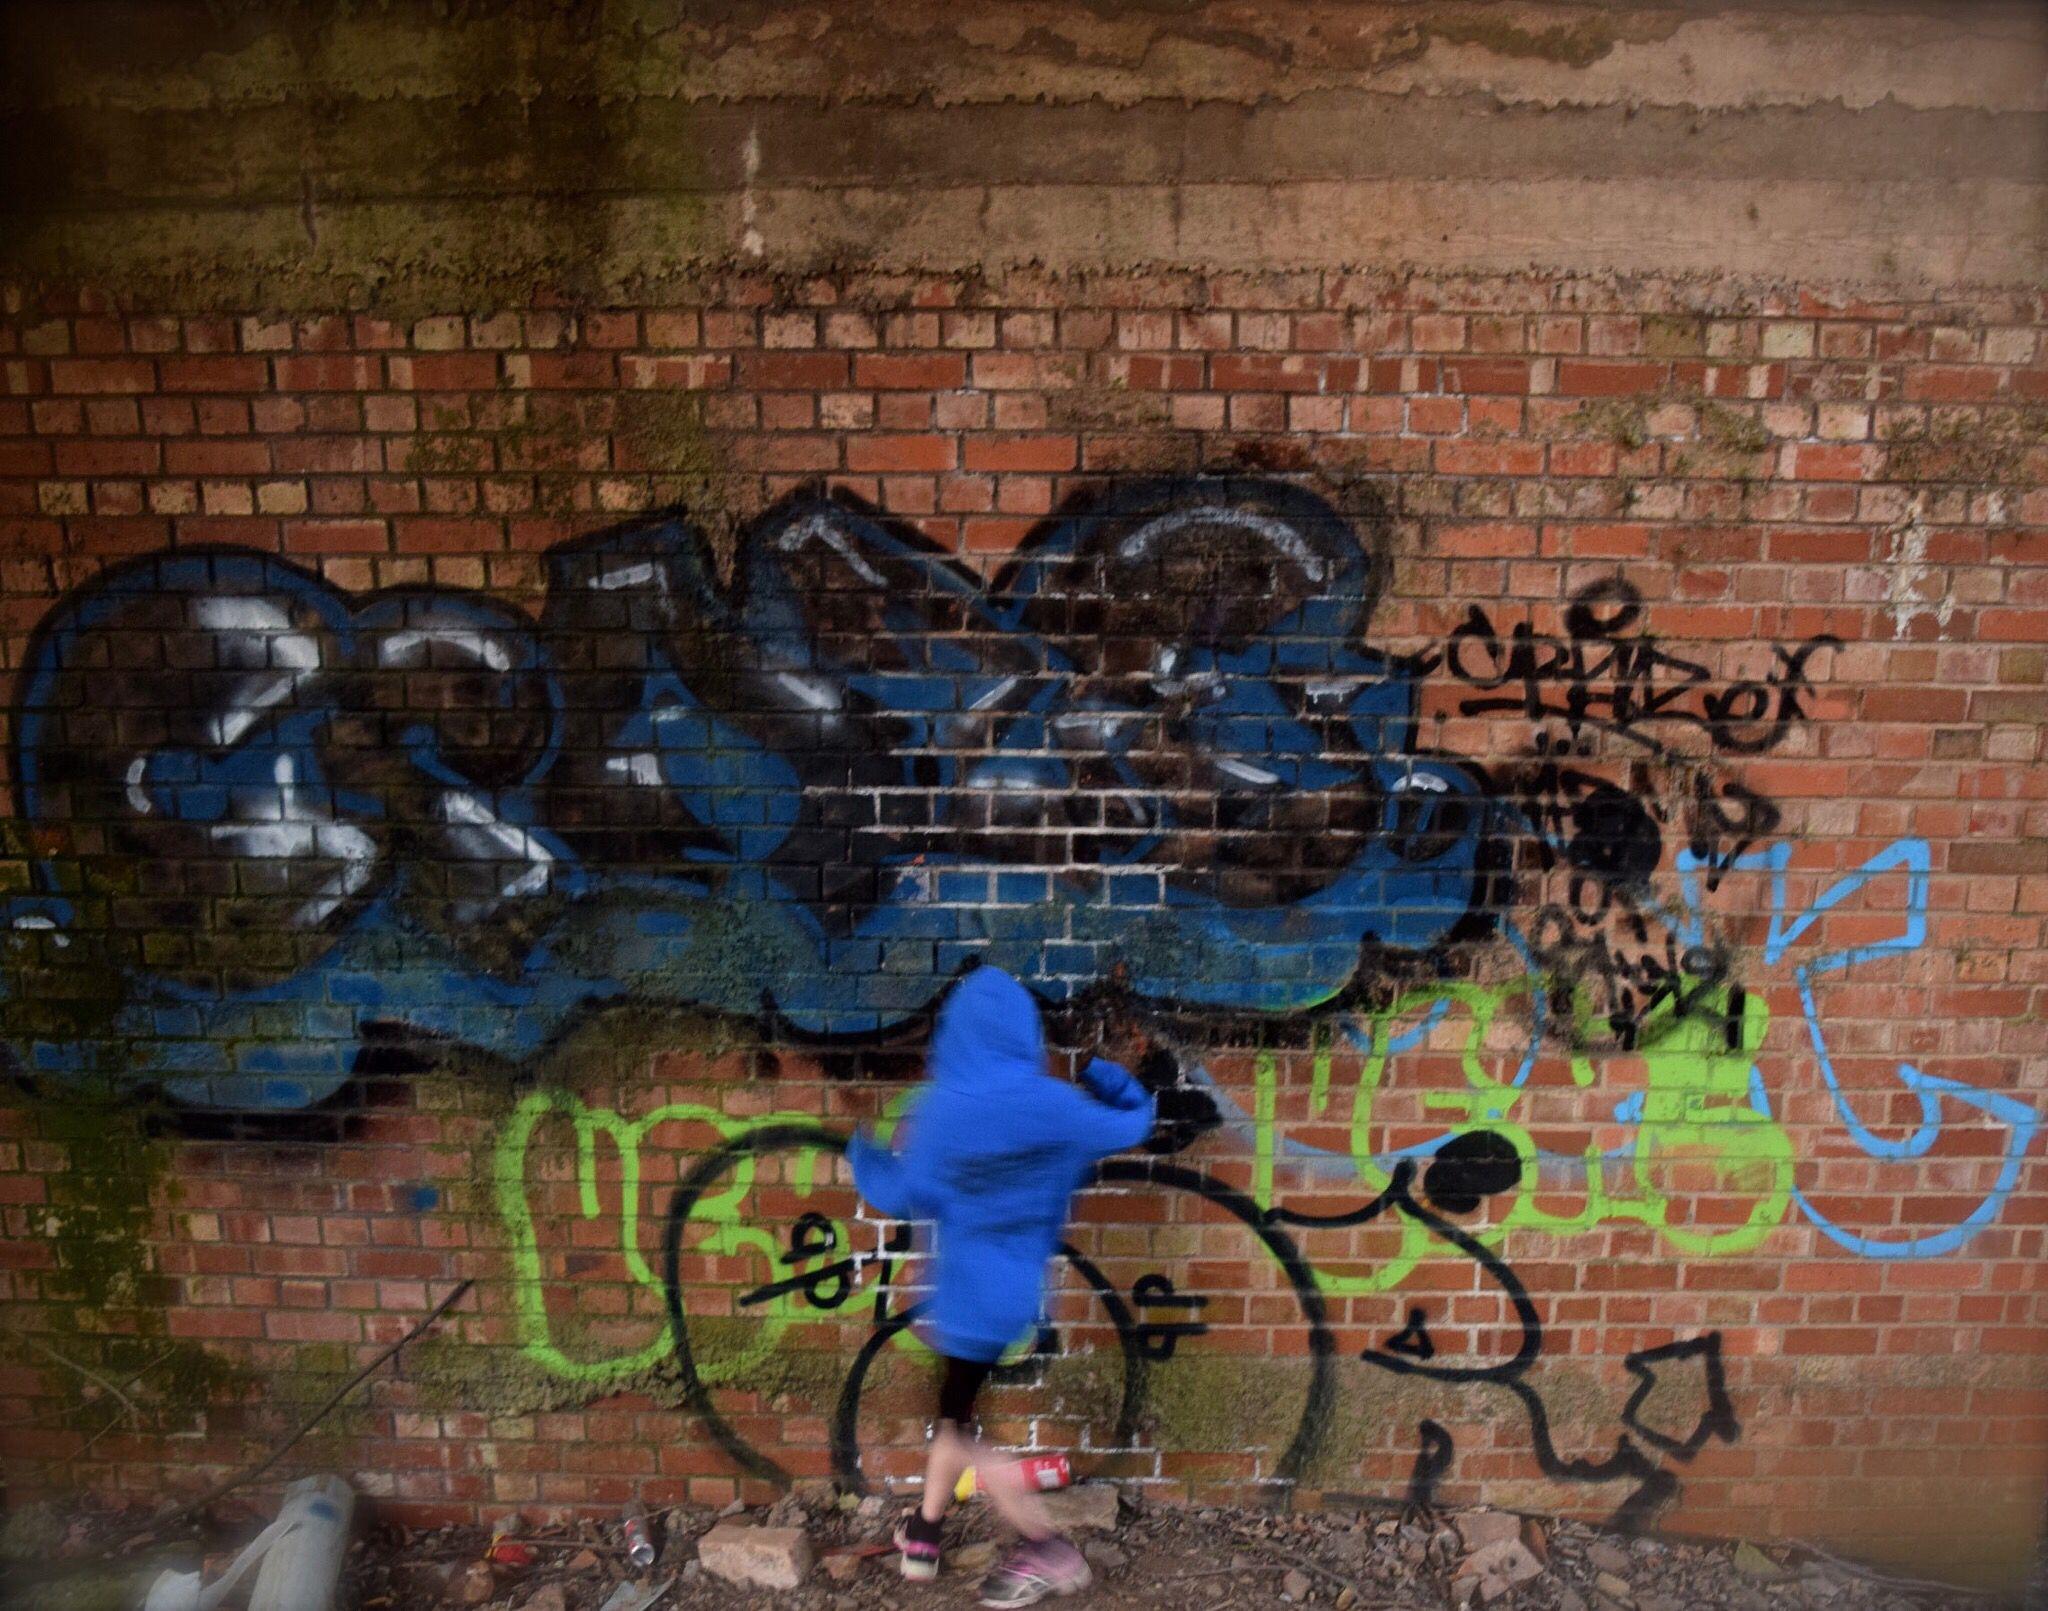 Graffiti artist but not really!